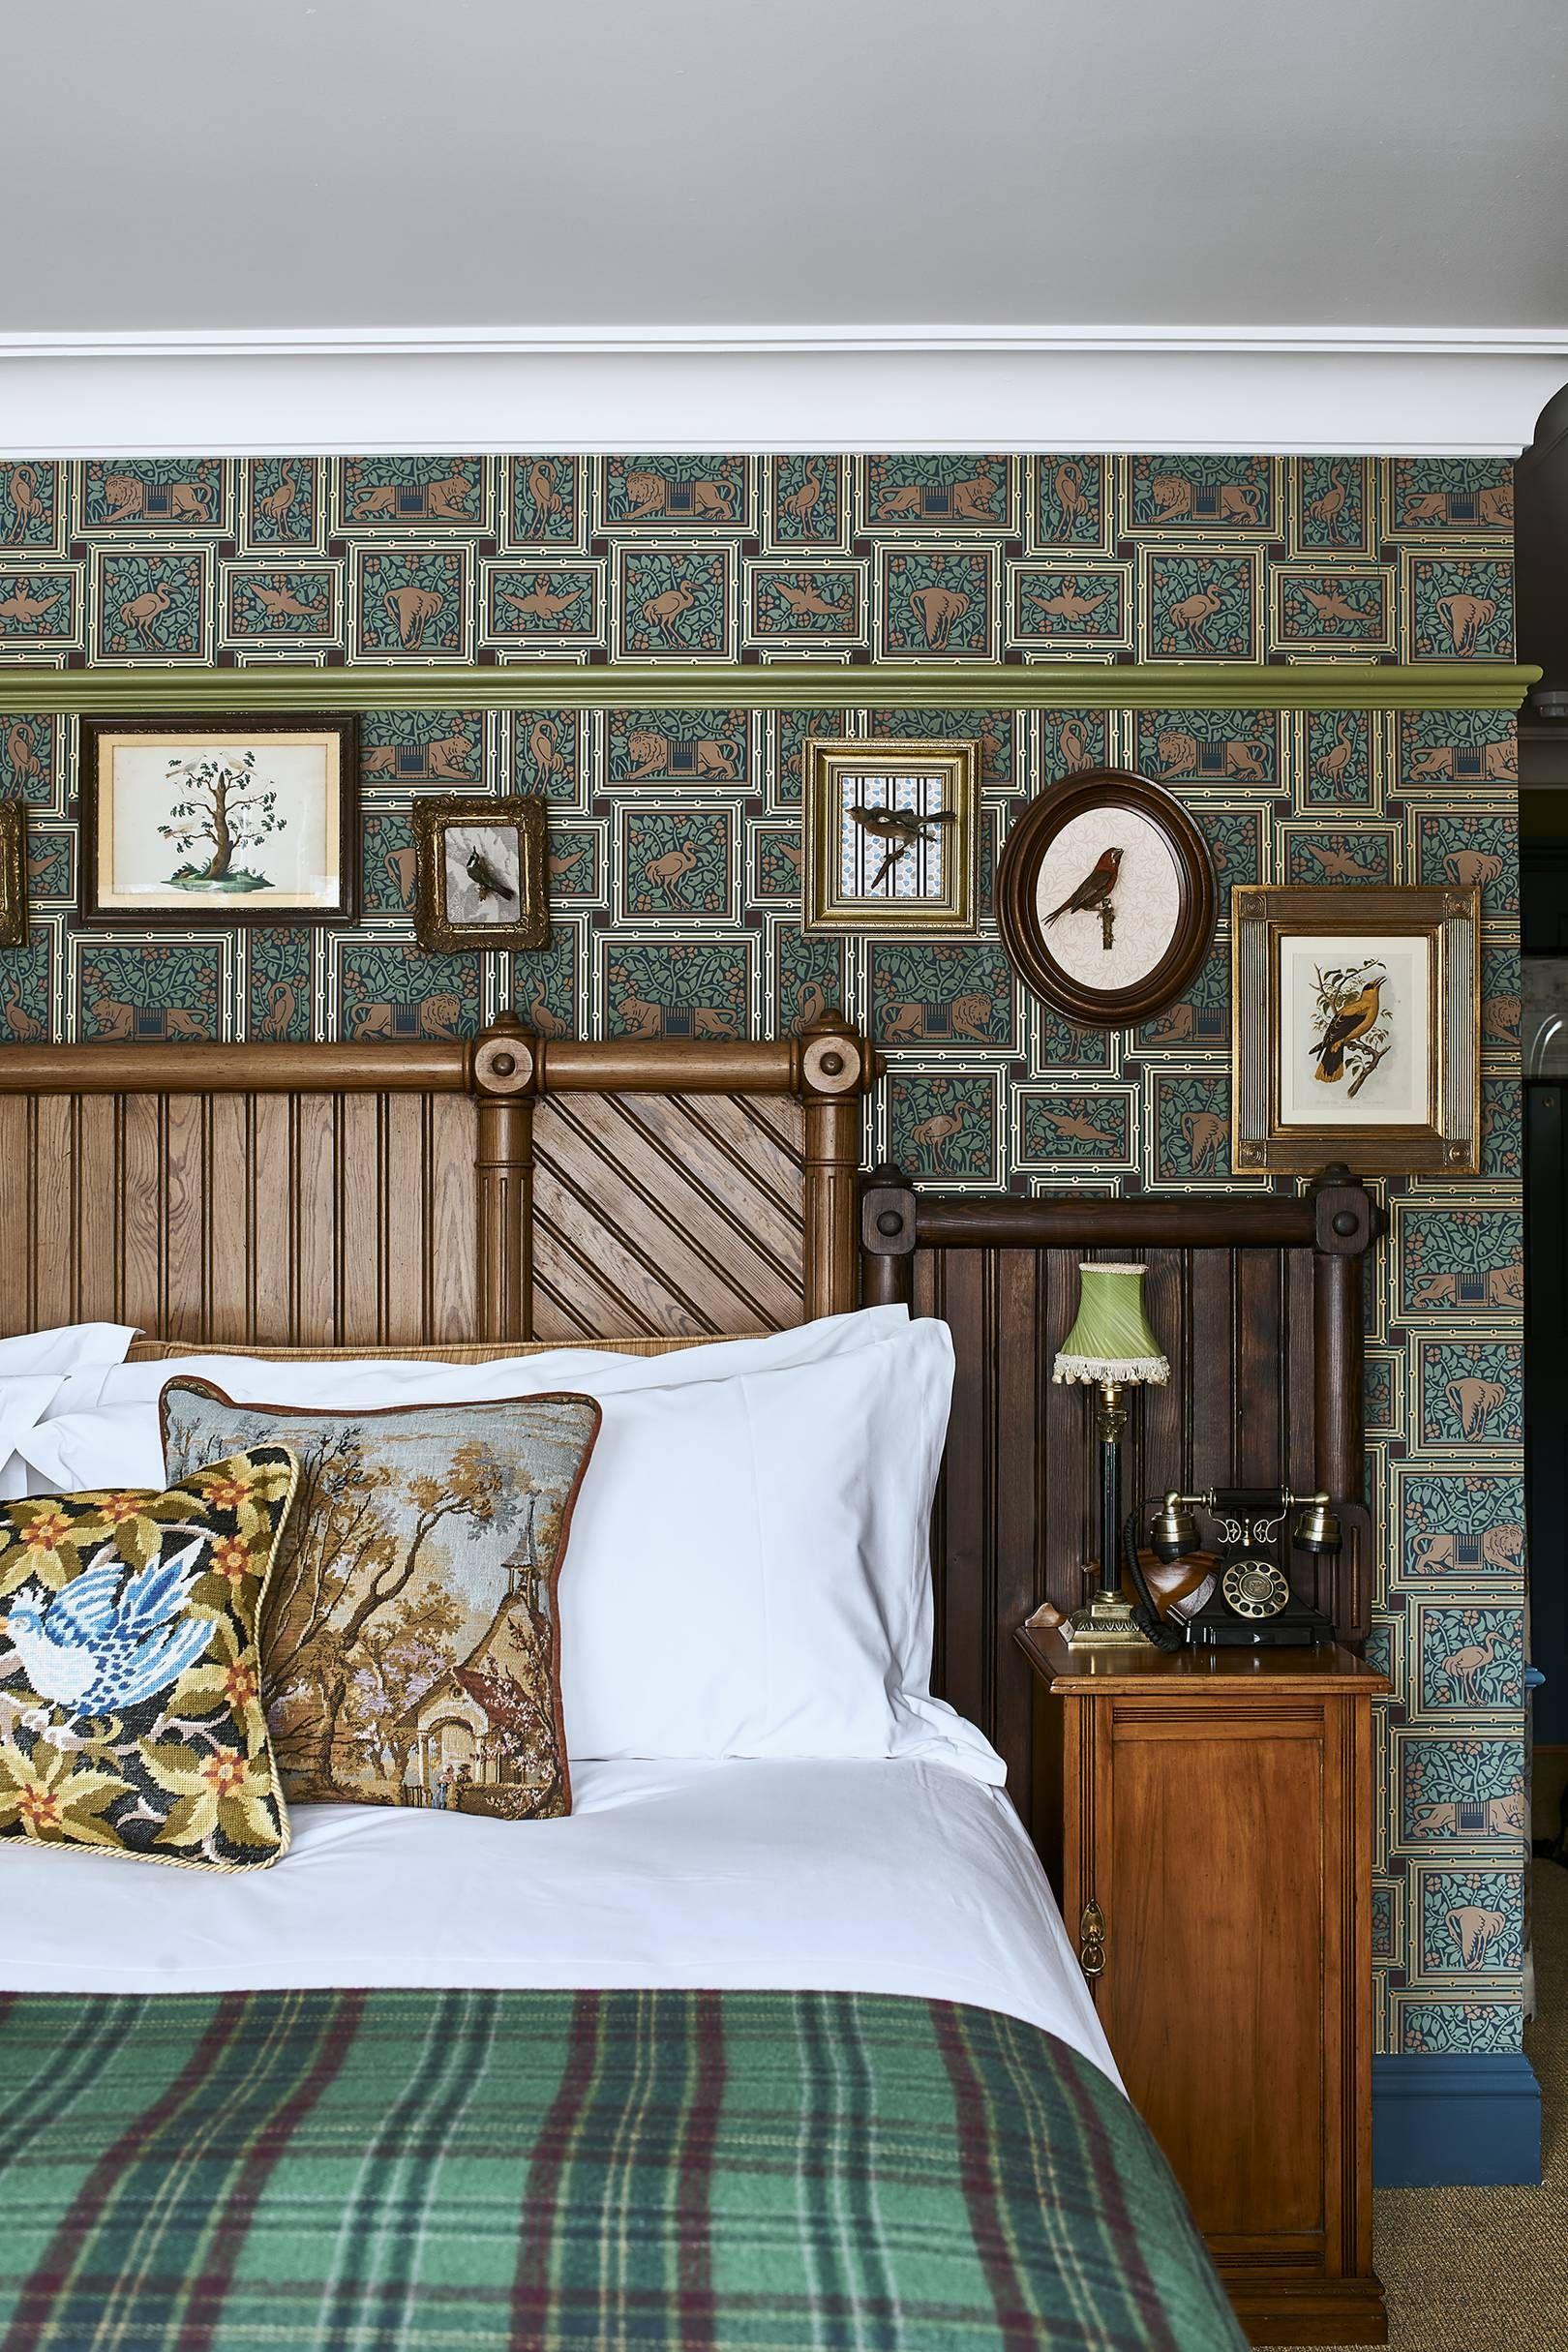 Hauser Wirth S Newest Venture Is A Scottish Hotel Of